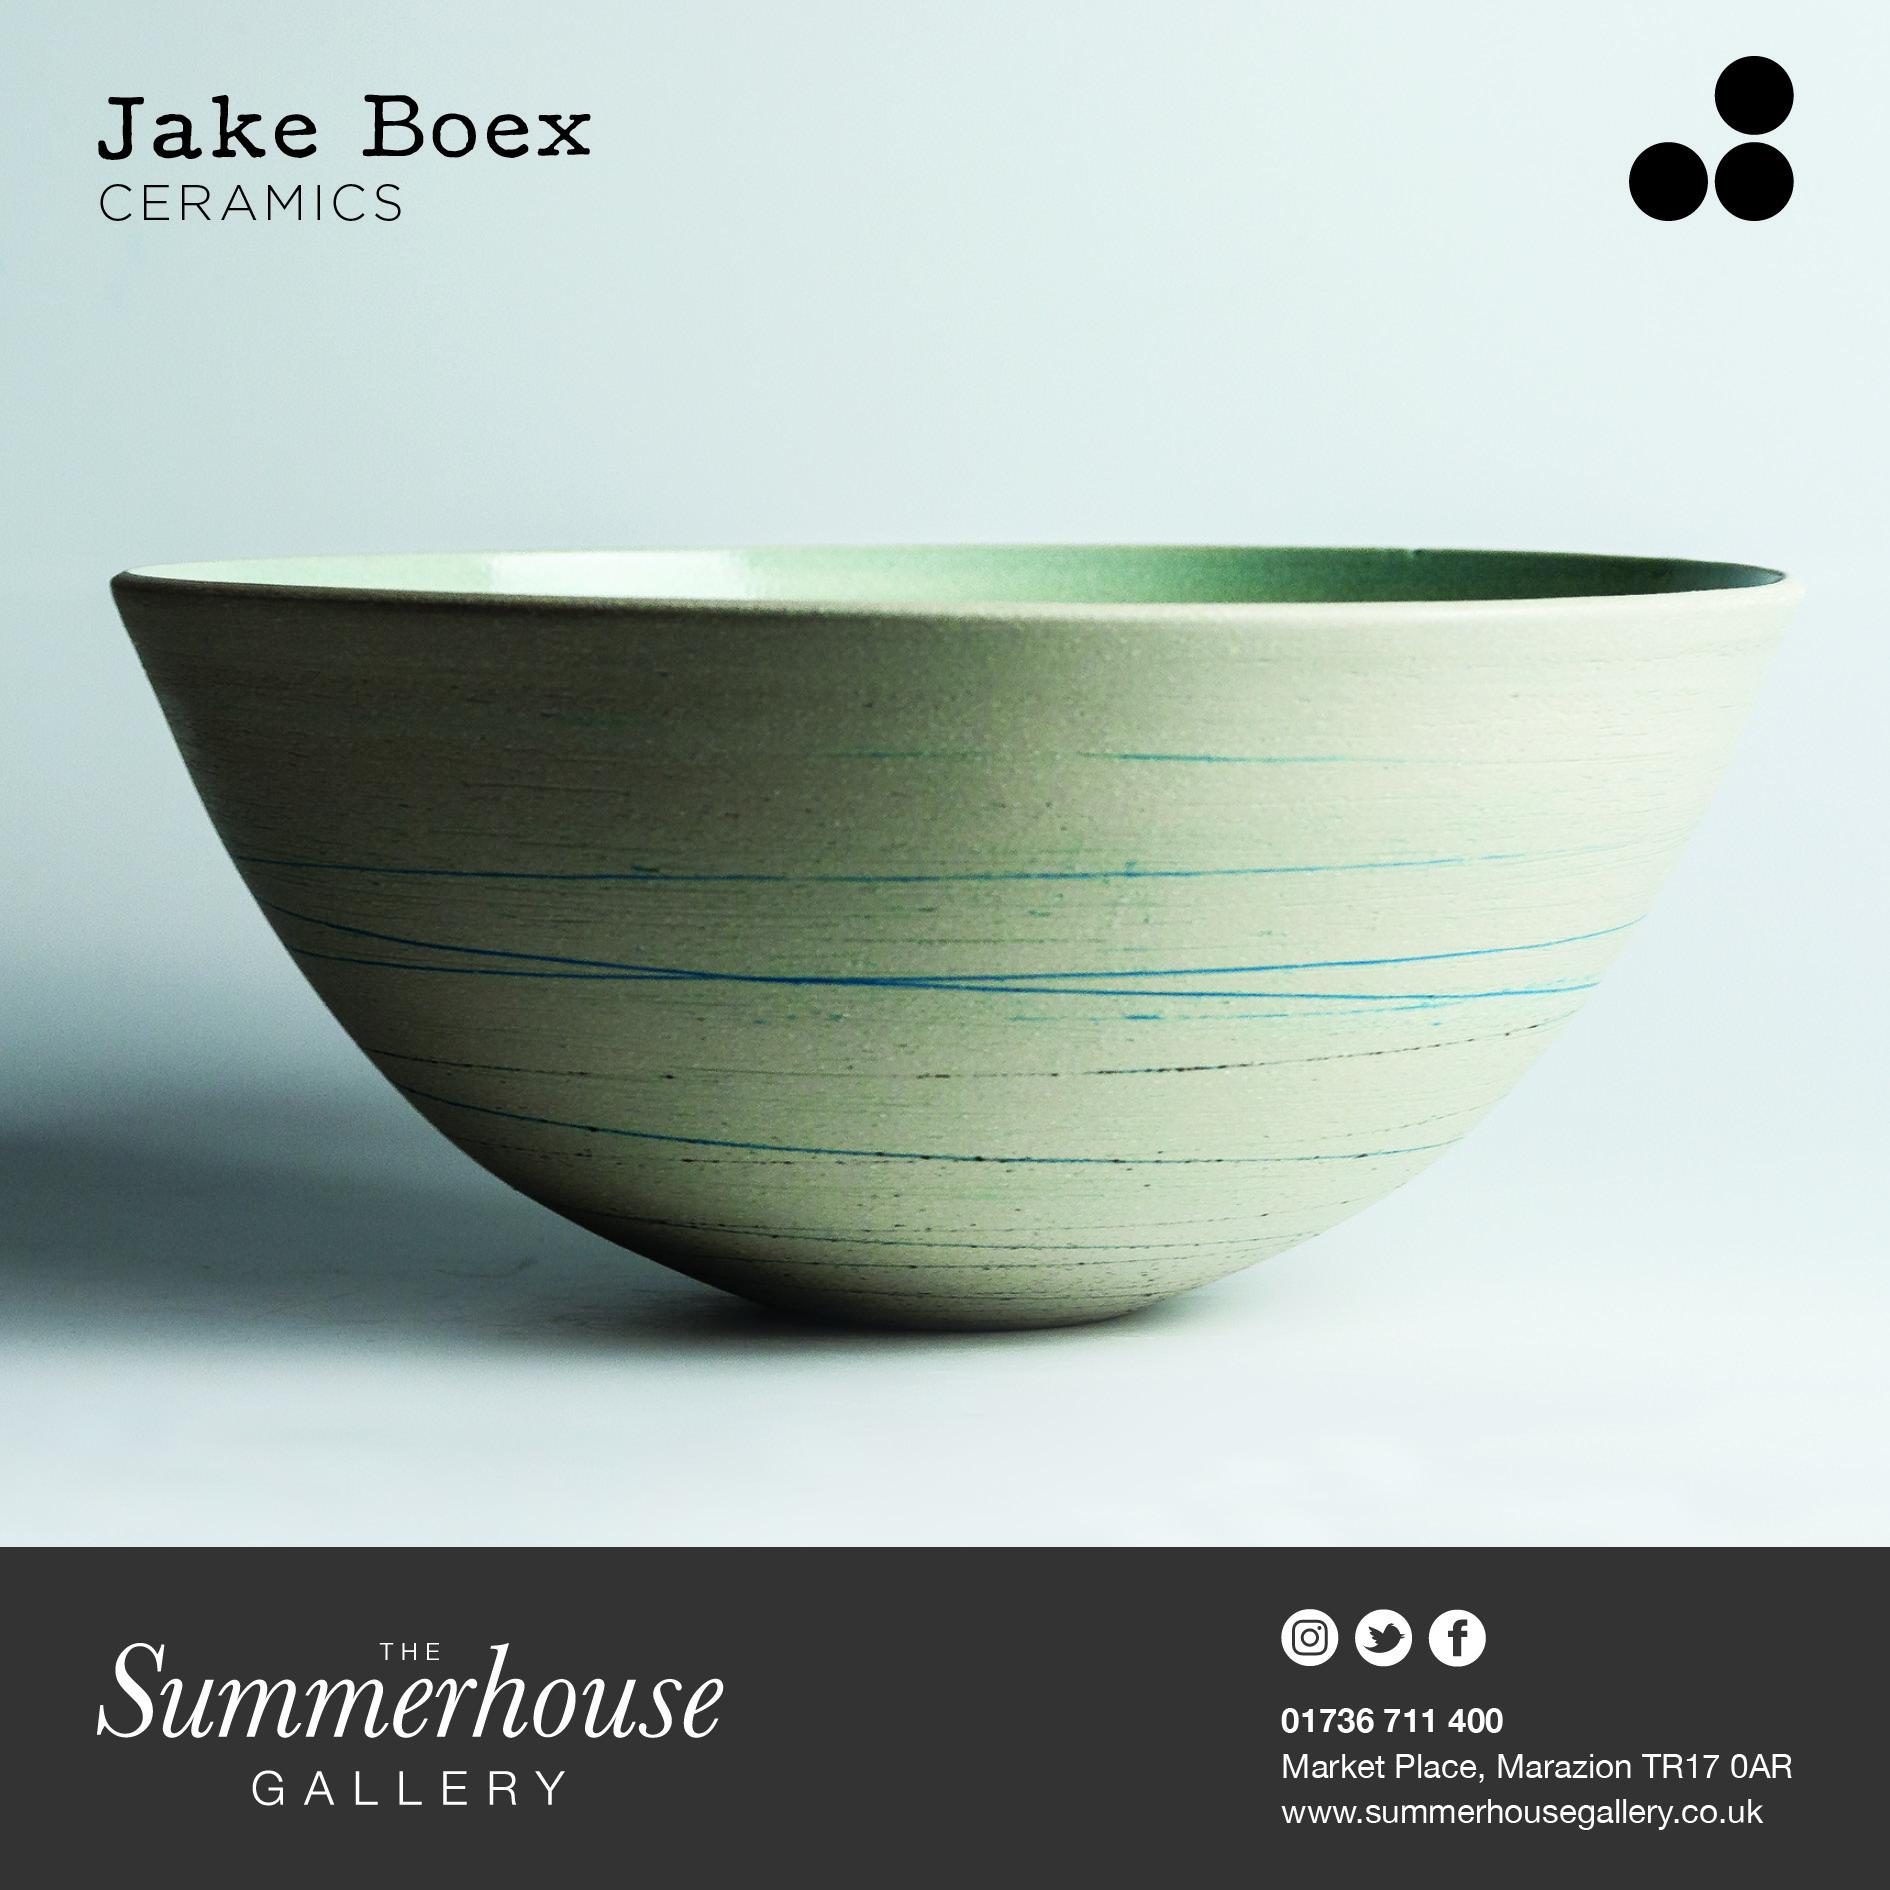 ????_TSHG Jake Boex artist cards_AW.jpeg